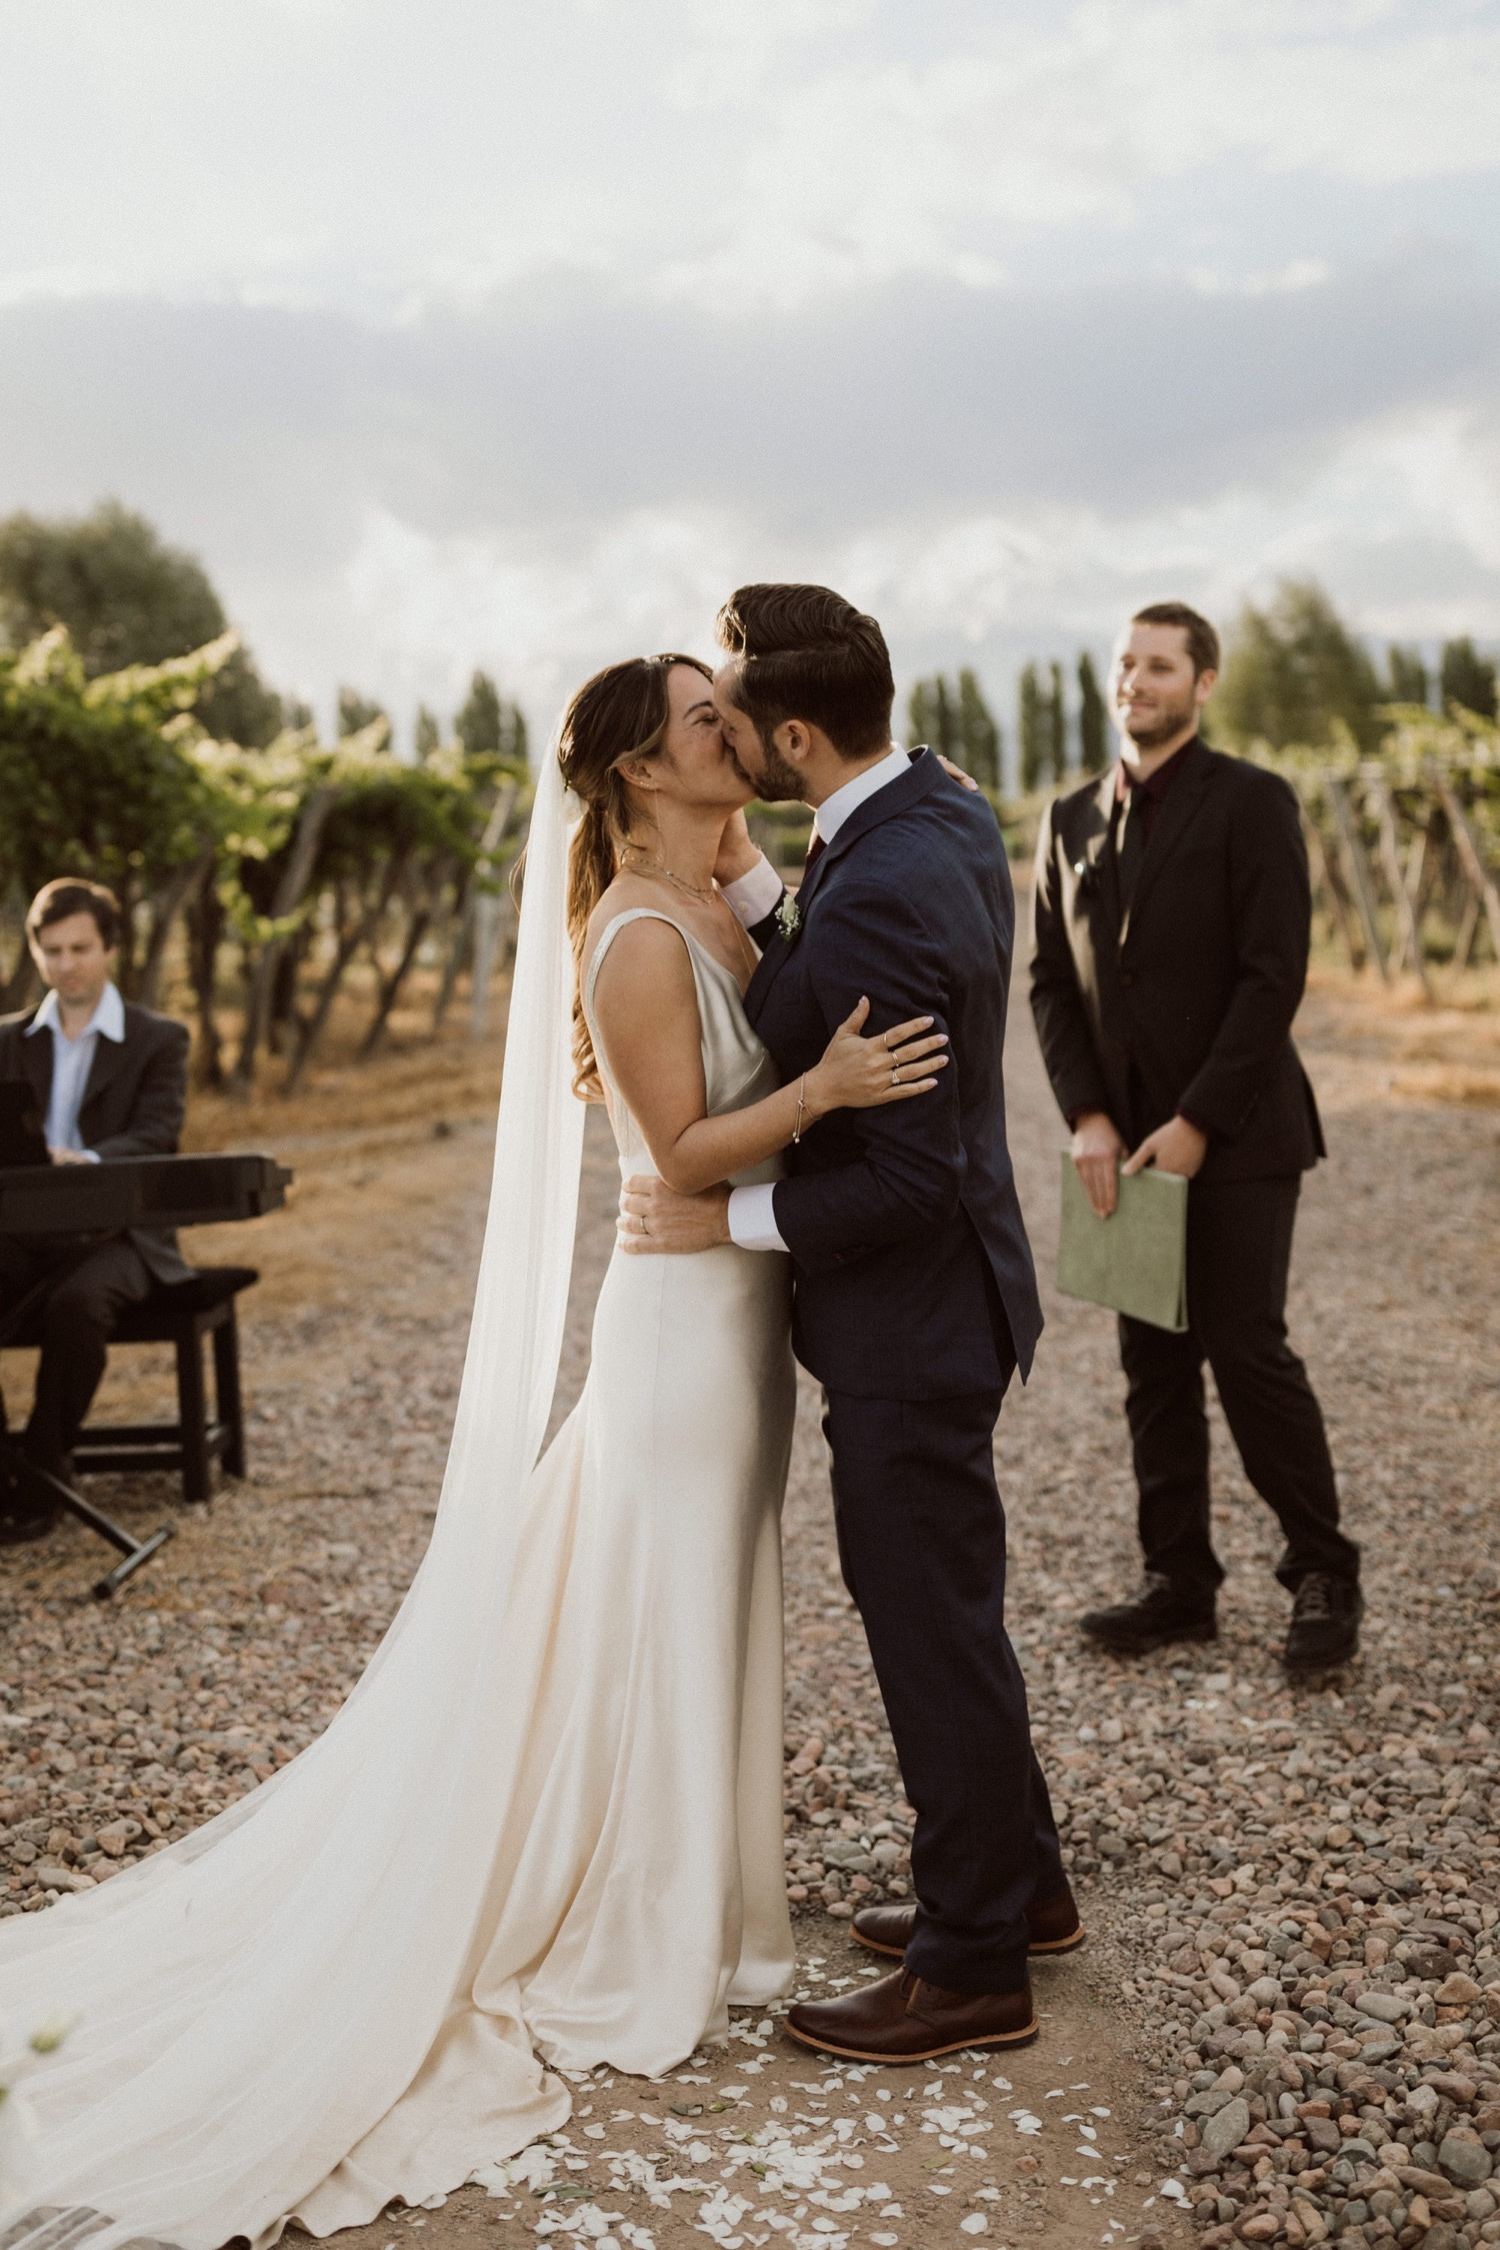 062_kiss_mendoza_photographer_wedding_argentina_first.jpg